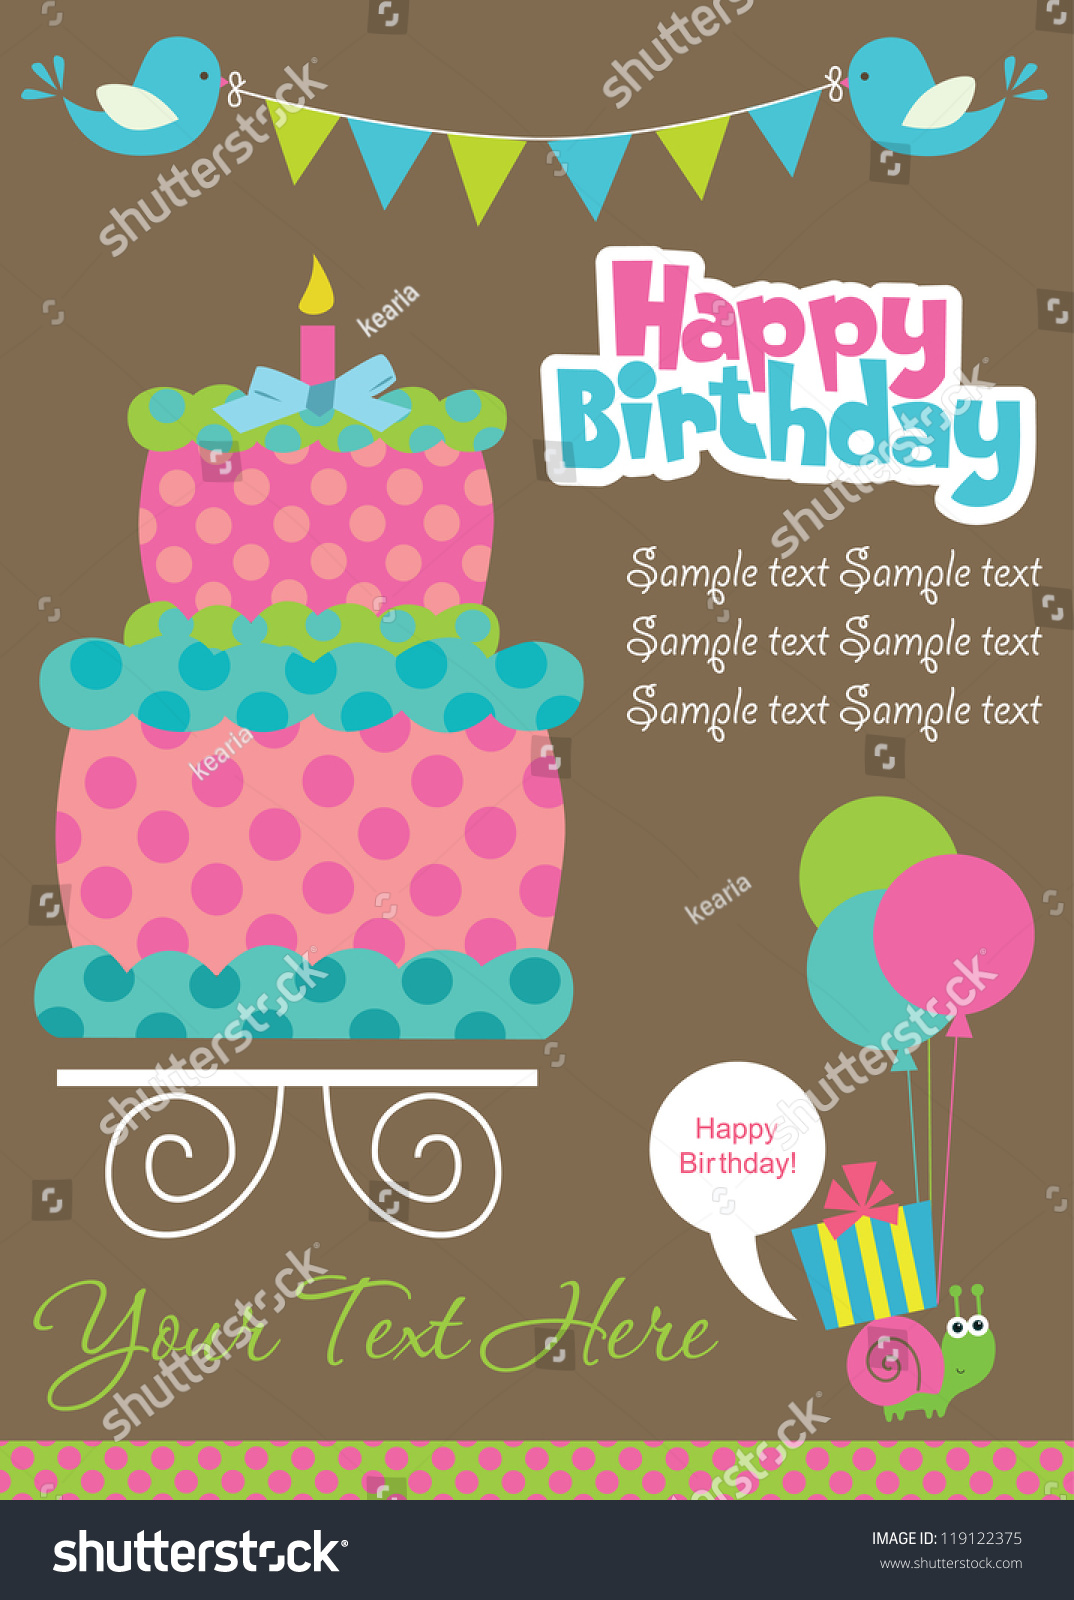 Happy Birthday Cake Card Design Vector Stock Vector Royalty Free